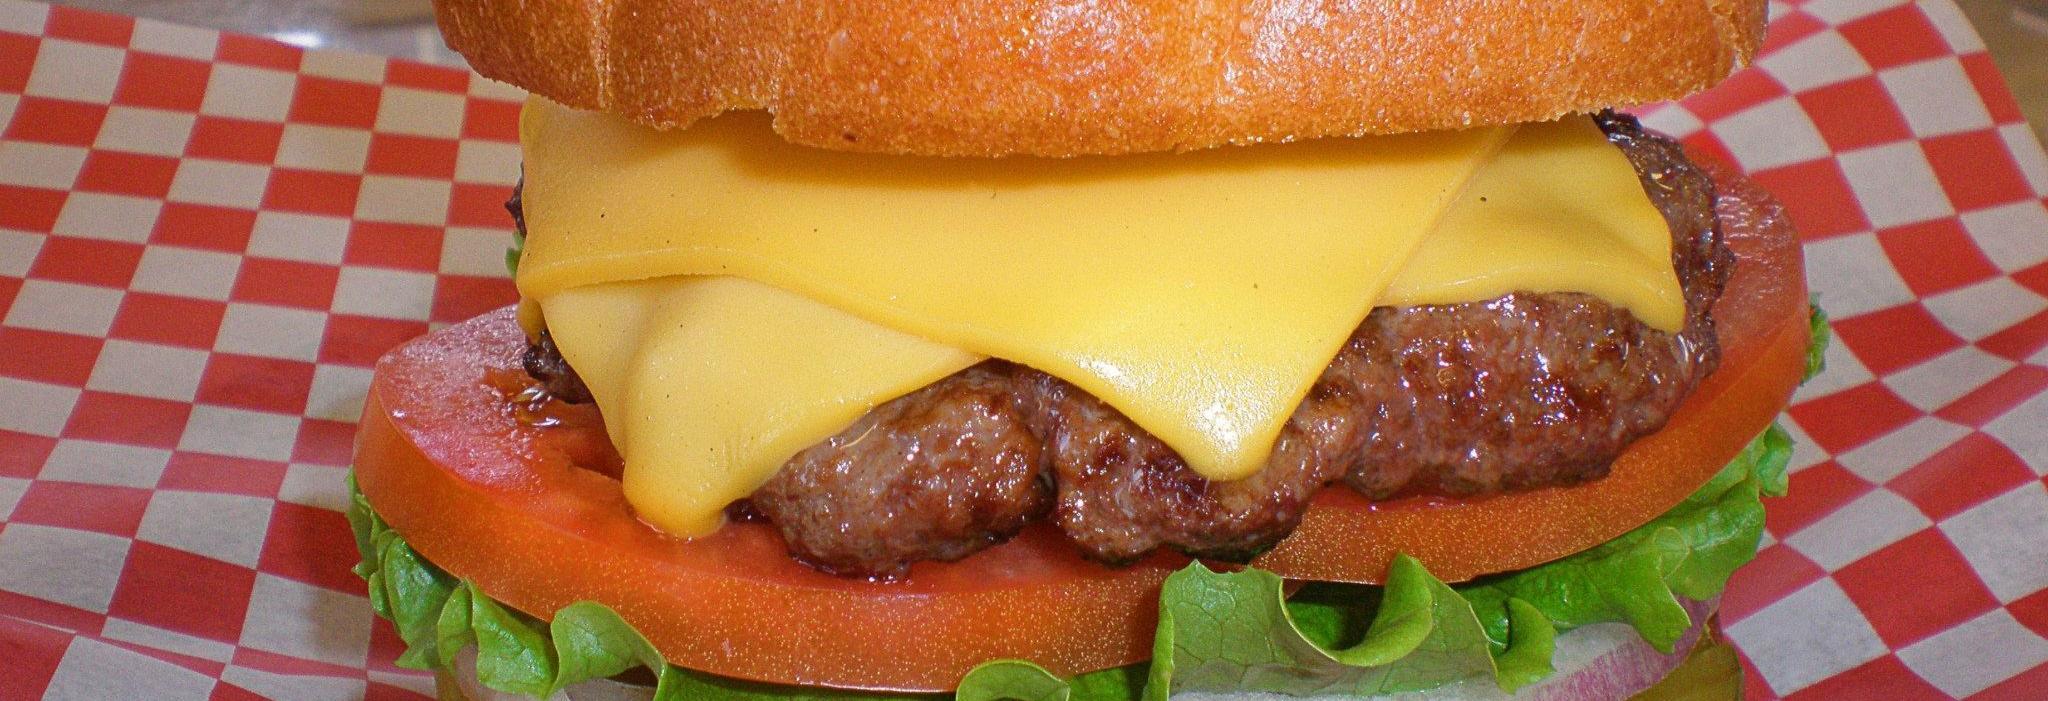 Red Wagon Burgers main banner image - Tacoma, WA